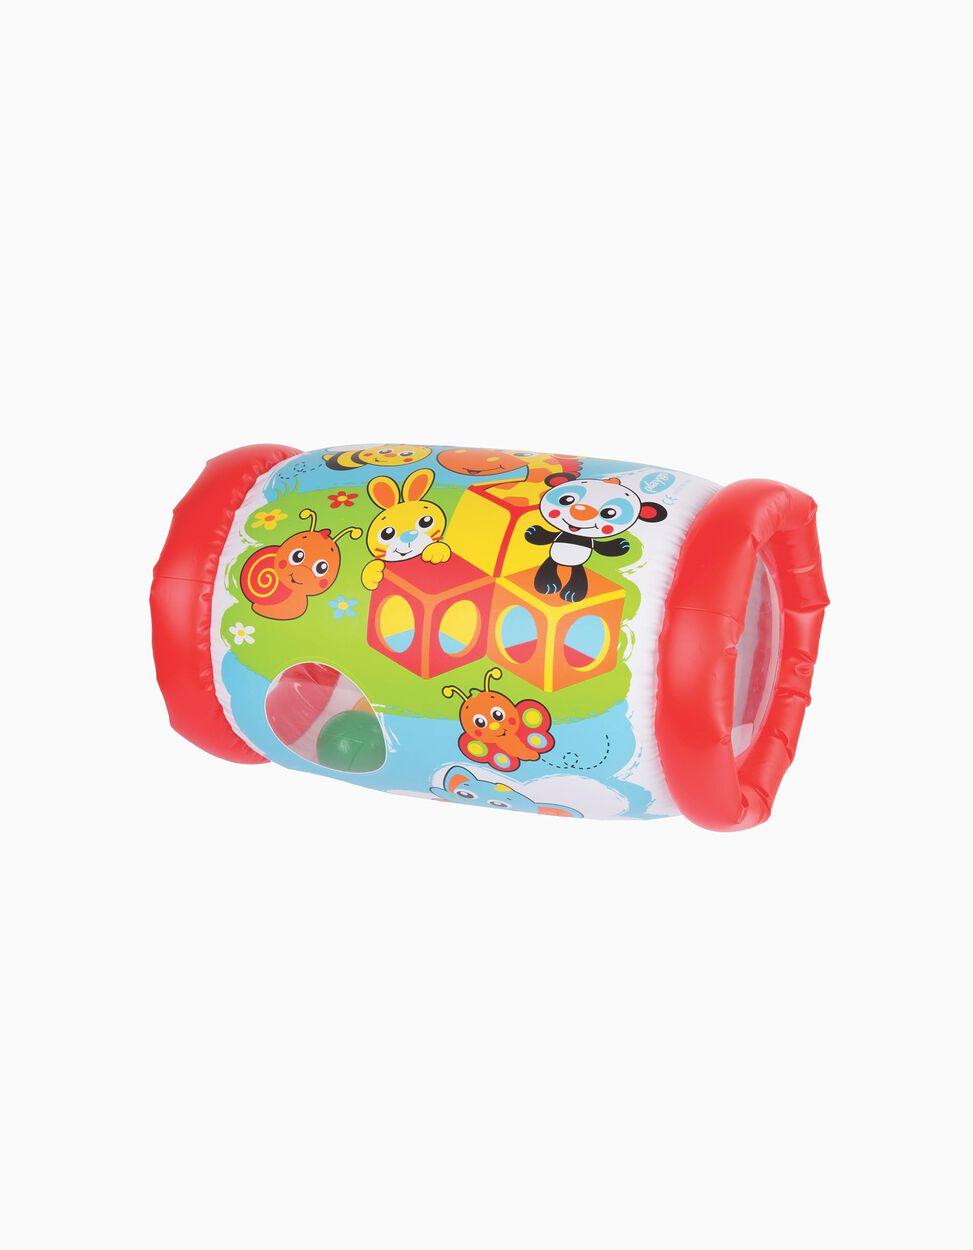 Inflatable Roller Jungle Peek Playgro 6M+